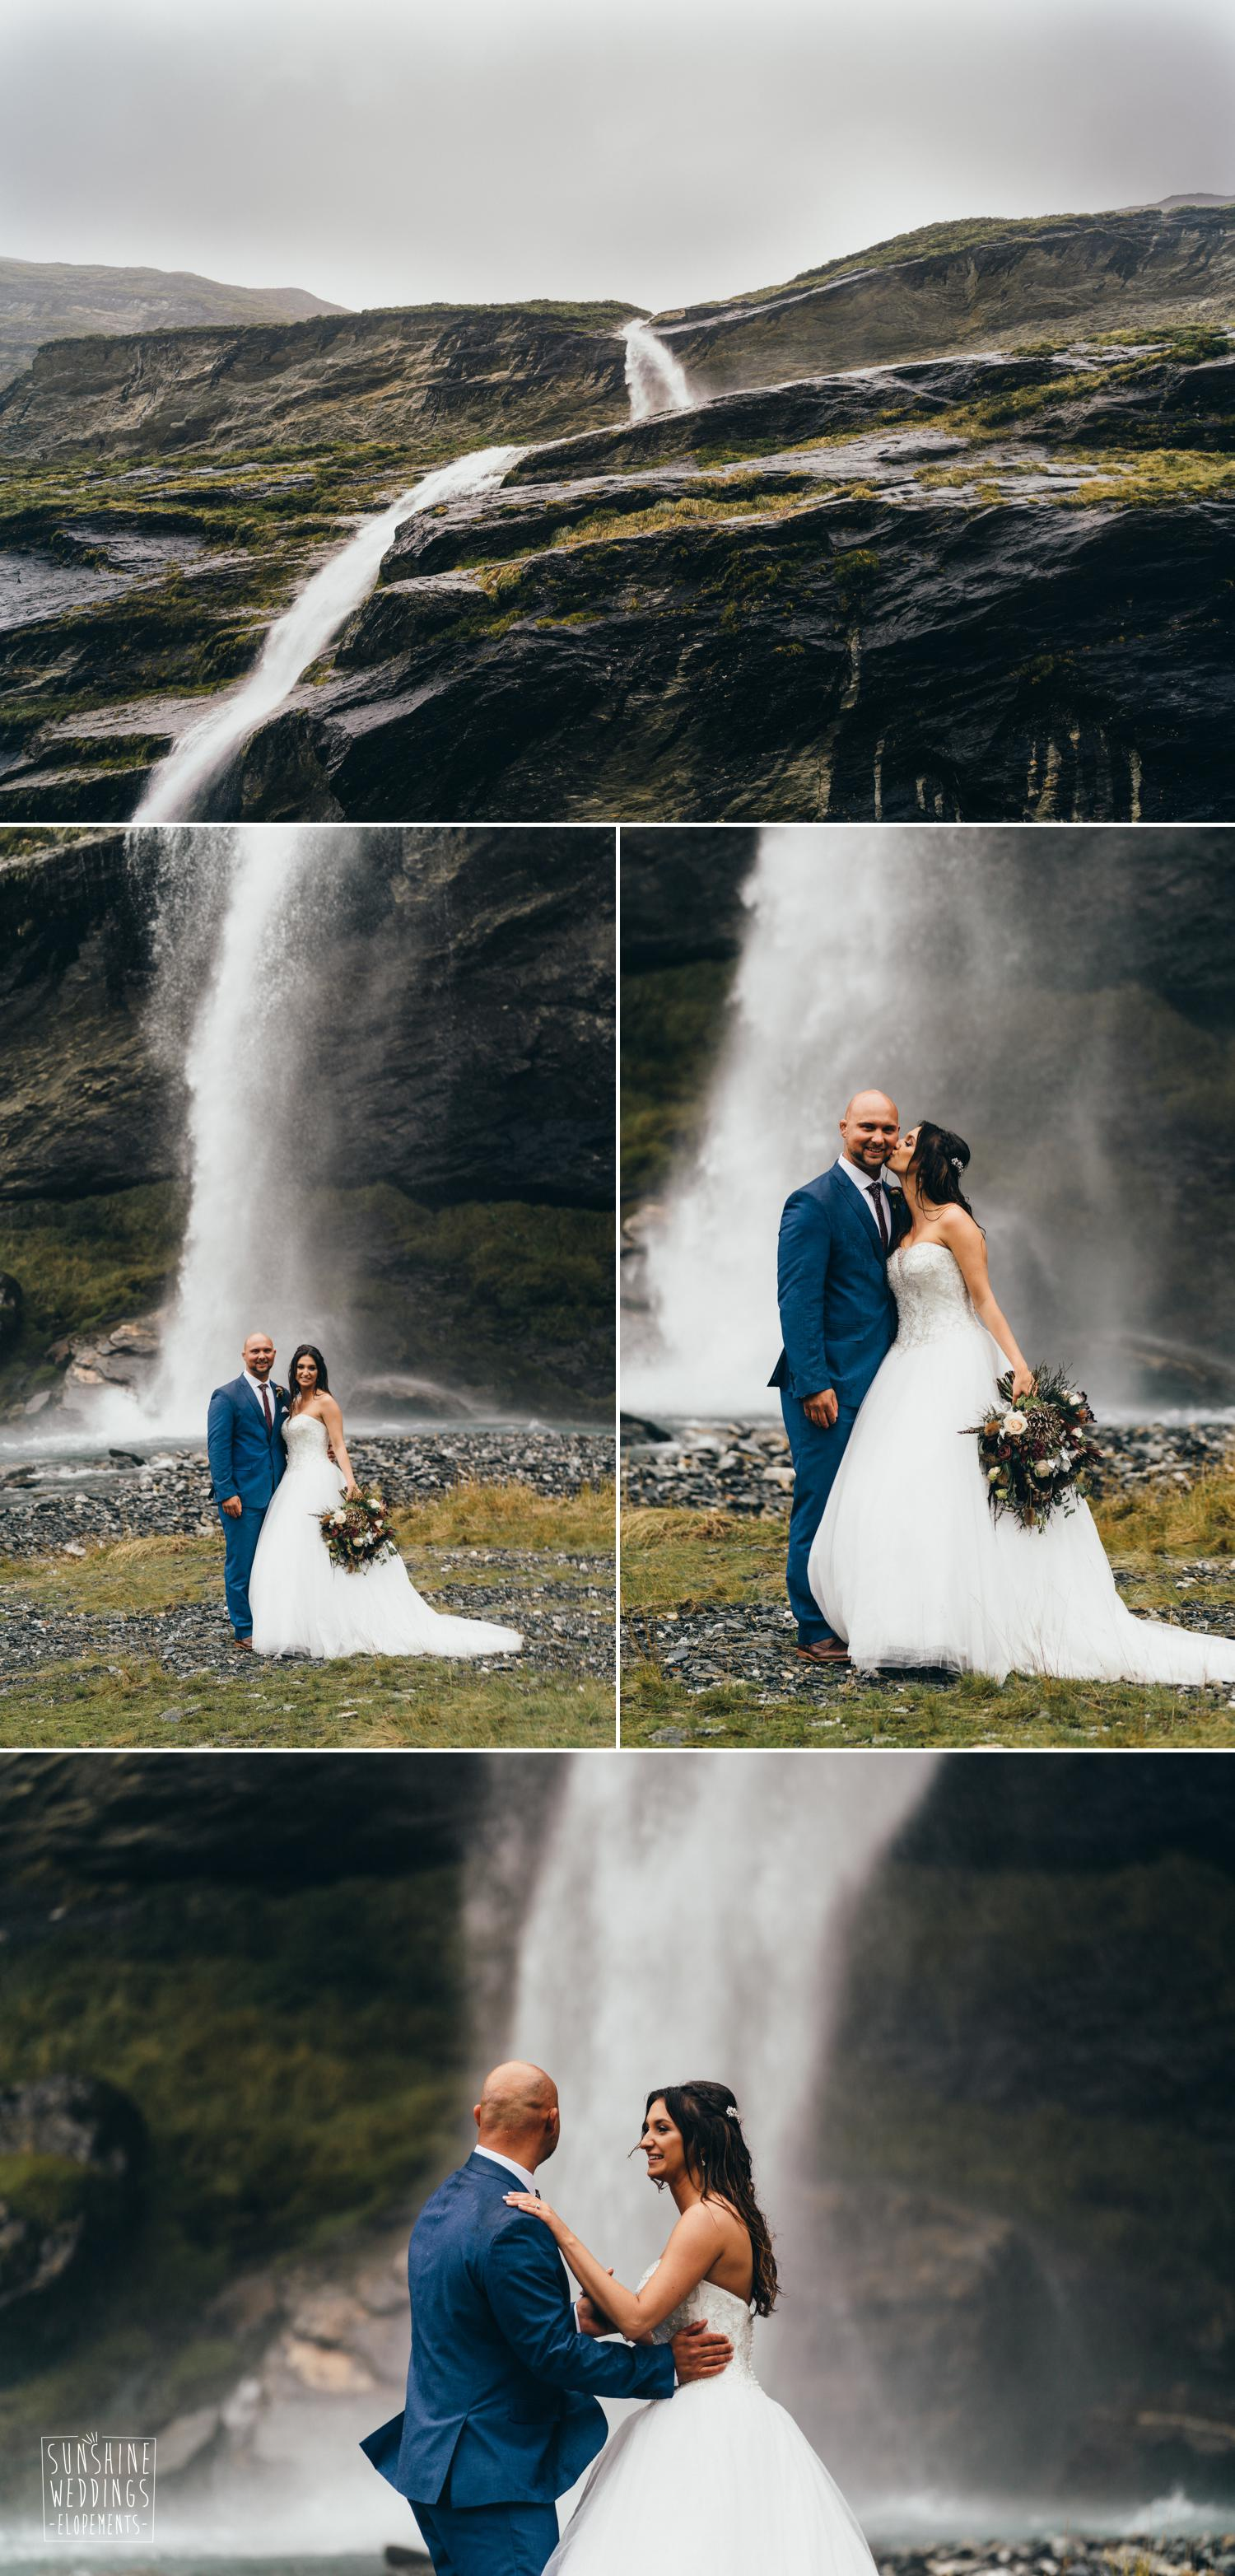 Waterfall wedding photograph